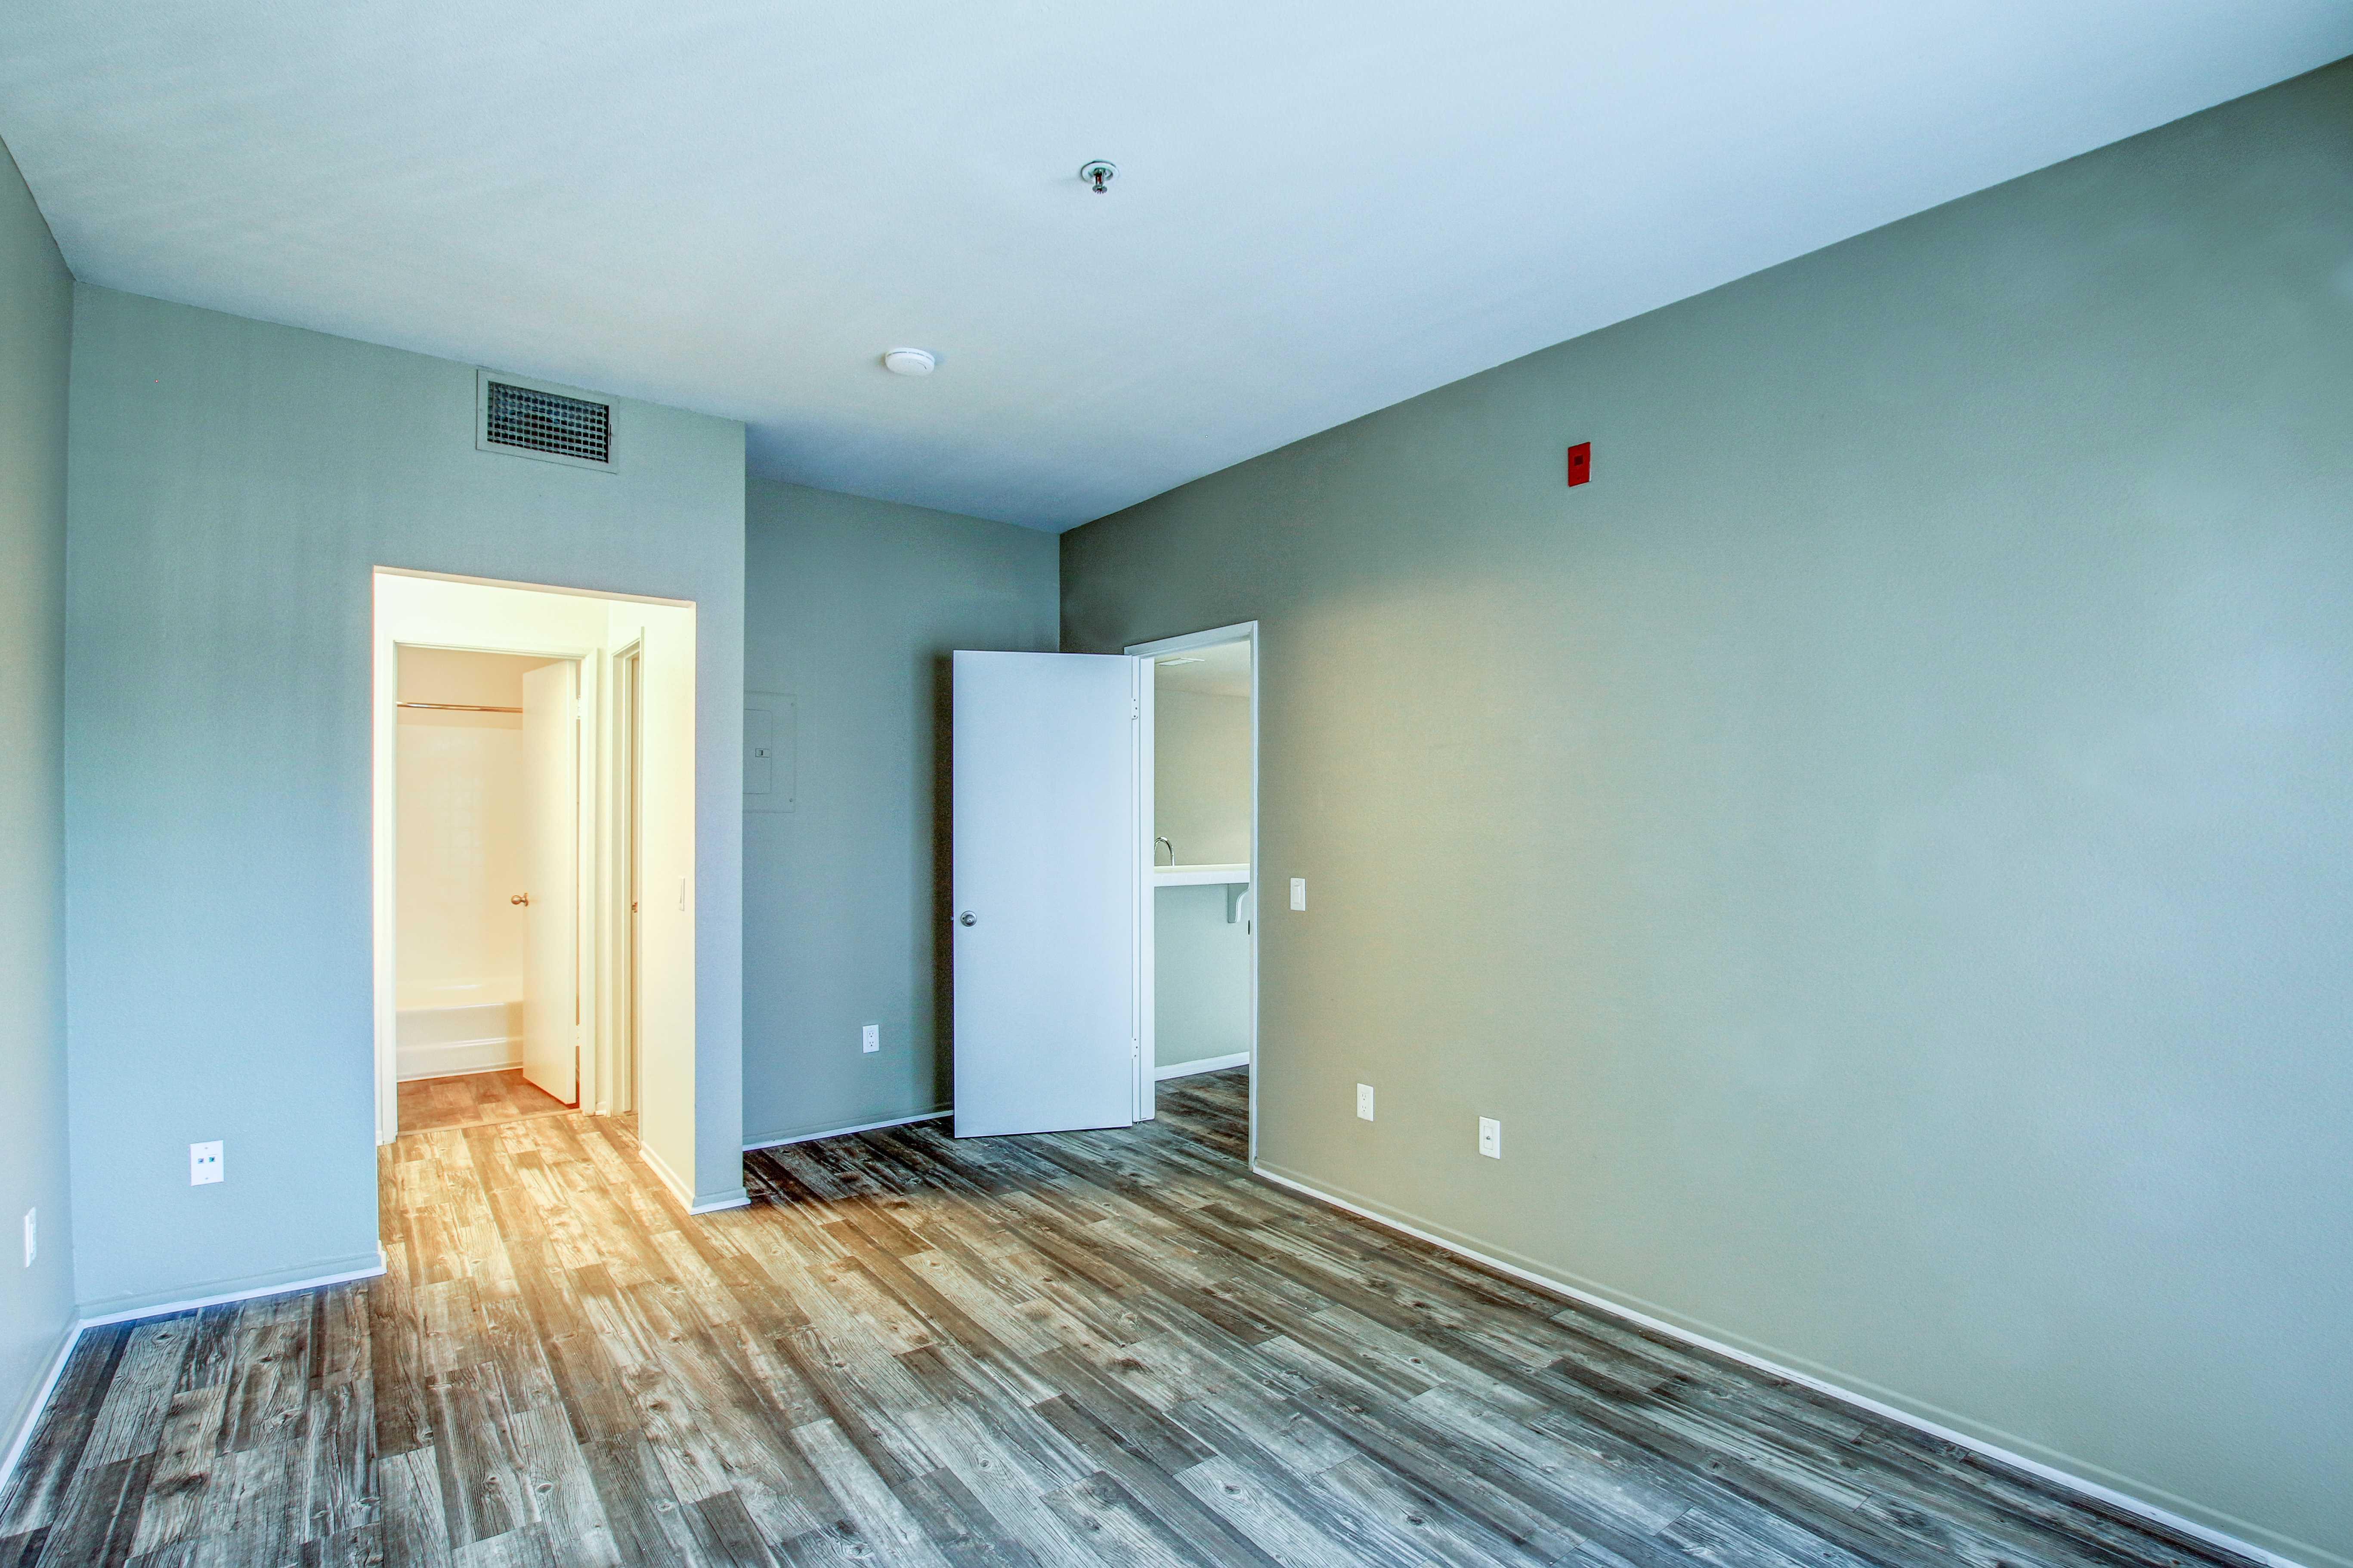 Bedroom with hardwood flooring in San Diego, California